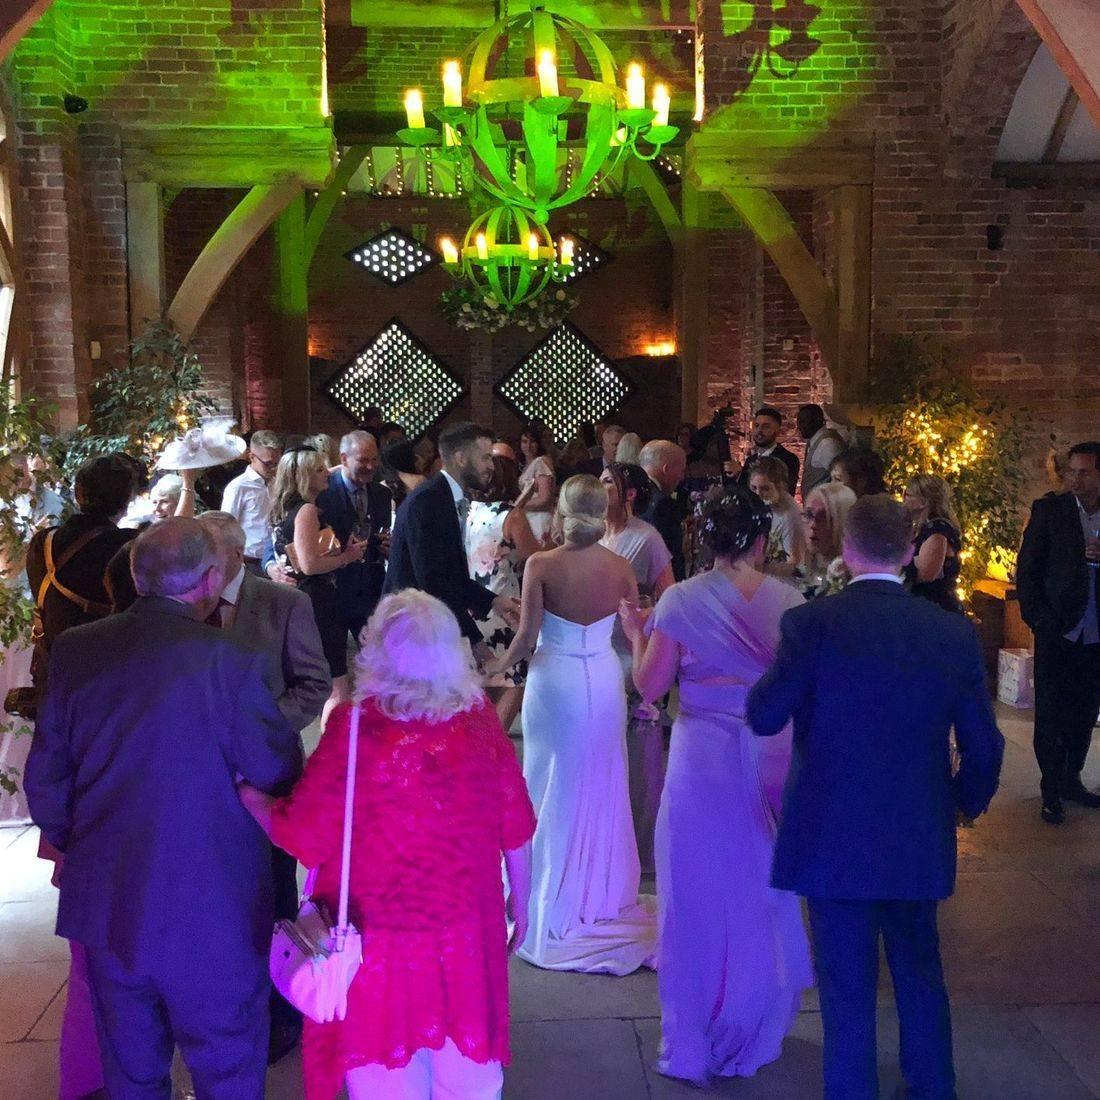 #Warwickshire #wedding #dj #weddingentertainment #barn #barnwedding #Shustoke Barn